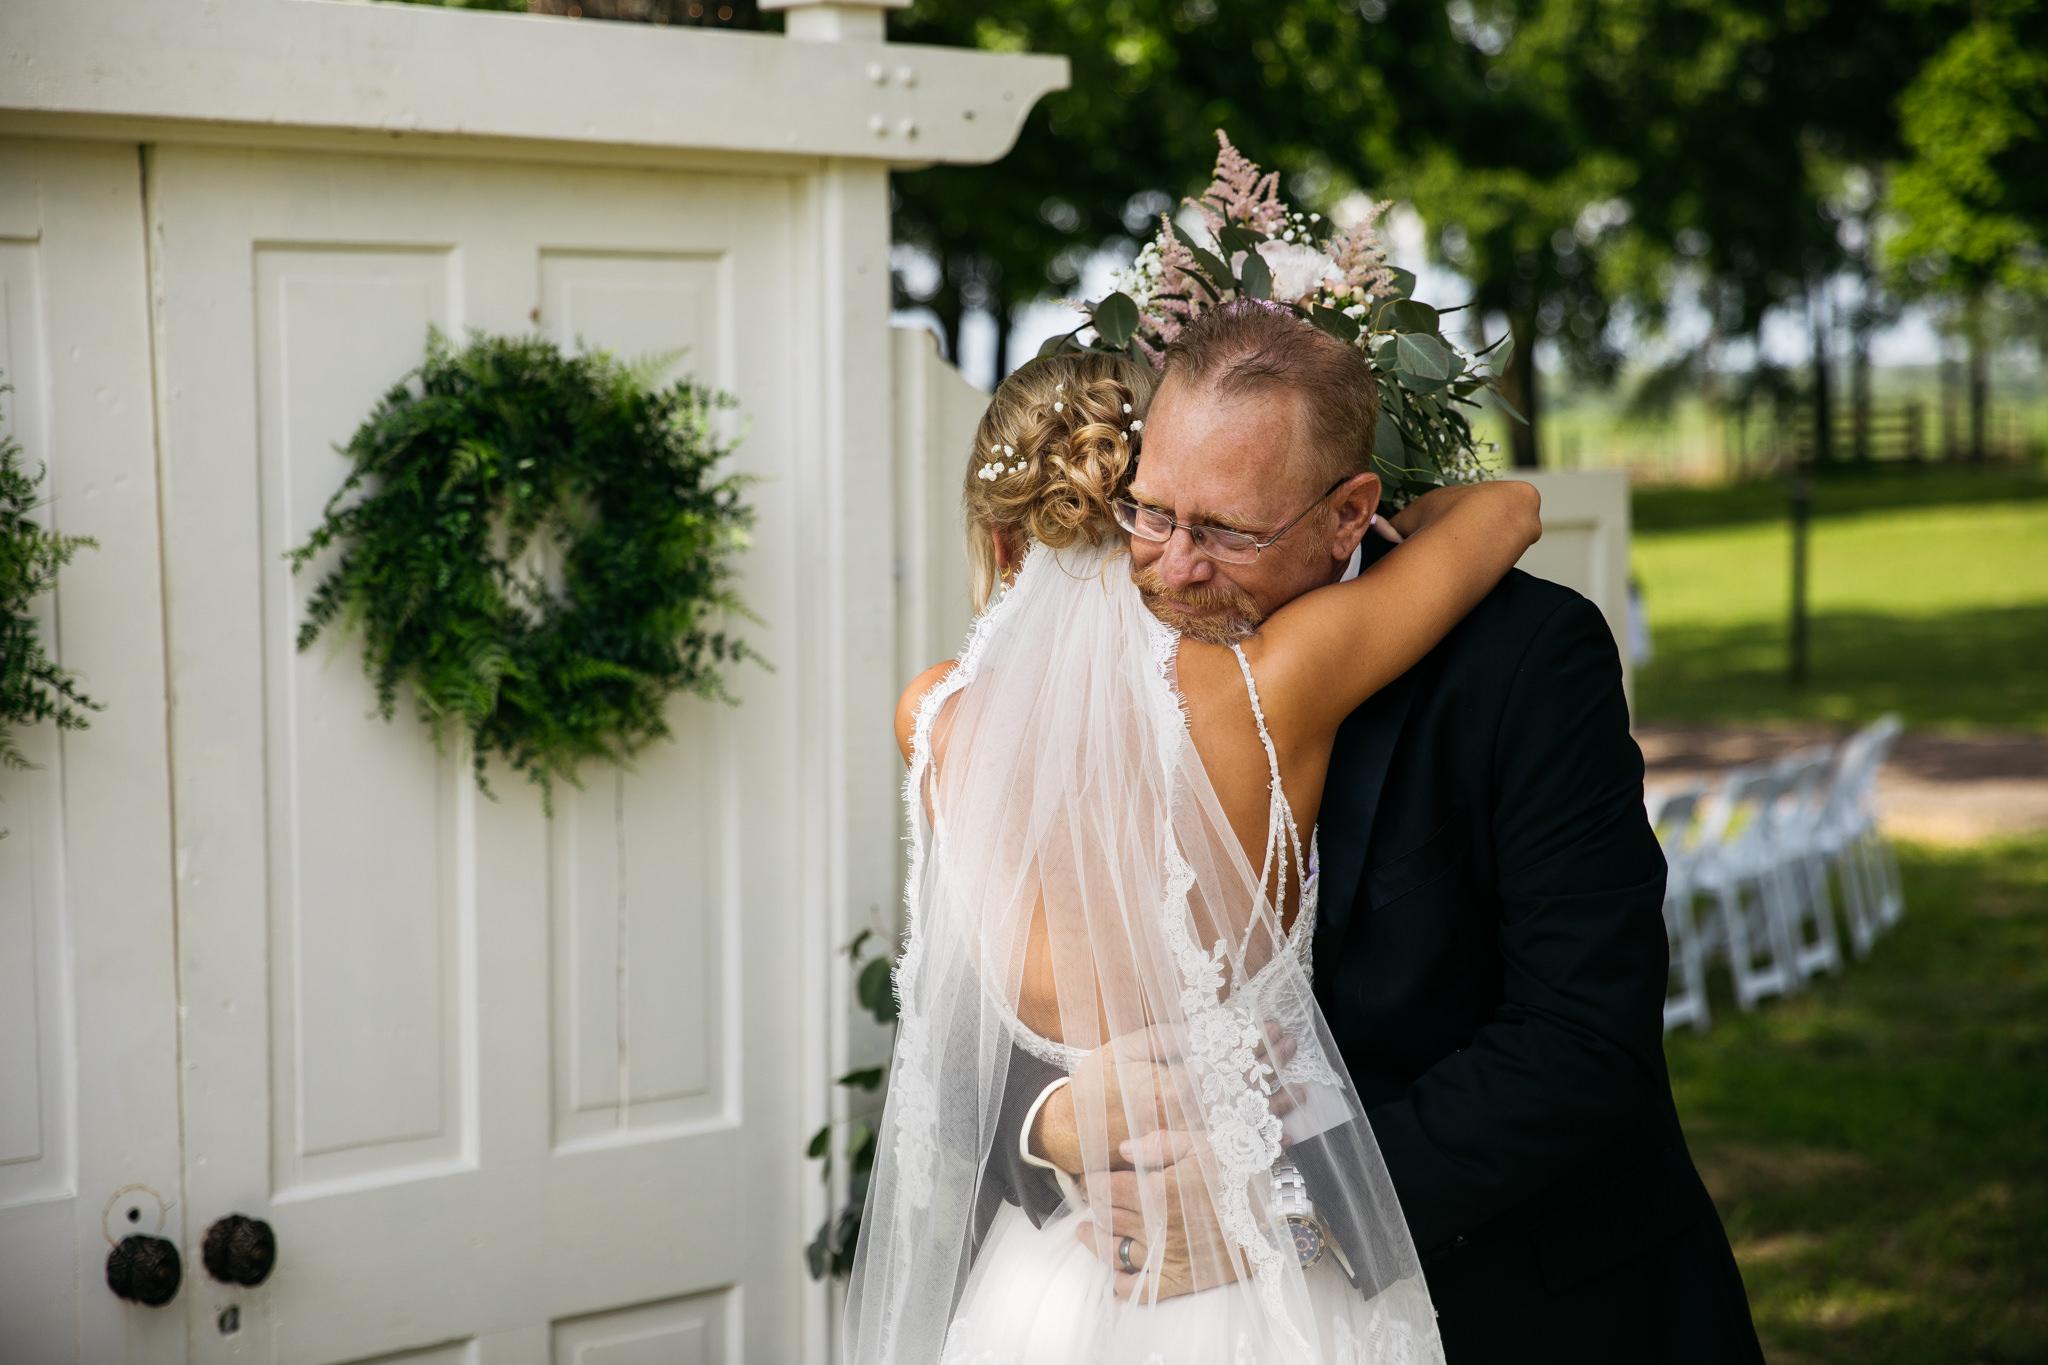 backyard-wedding-thewarmtharoundyou-lexy-branson-24.jpg